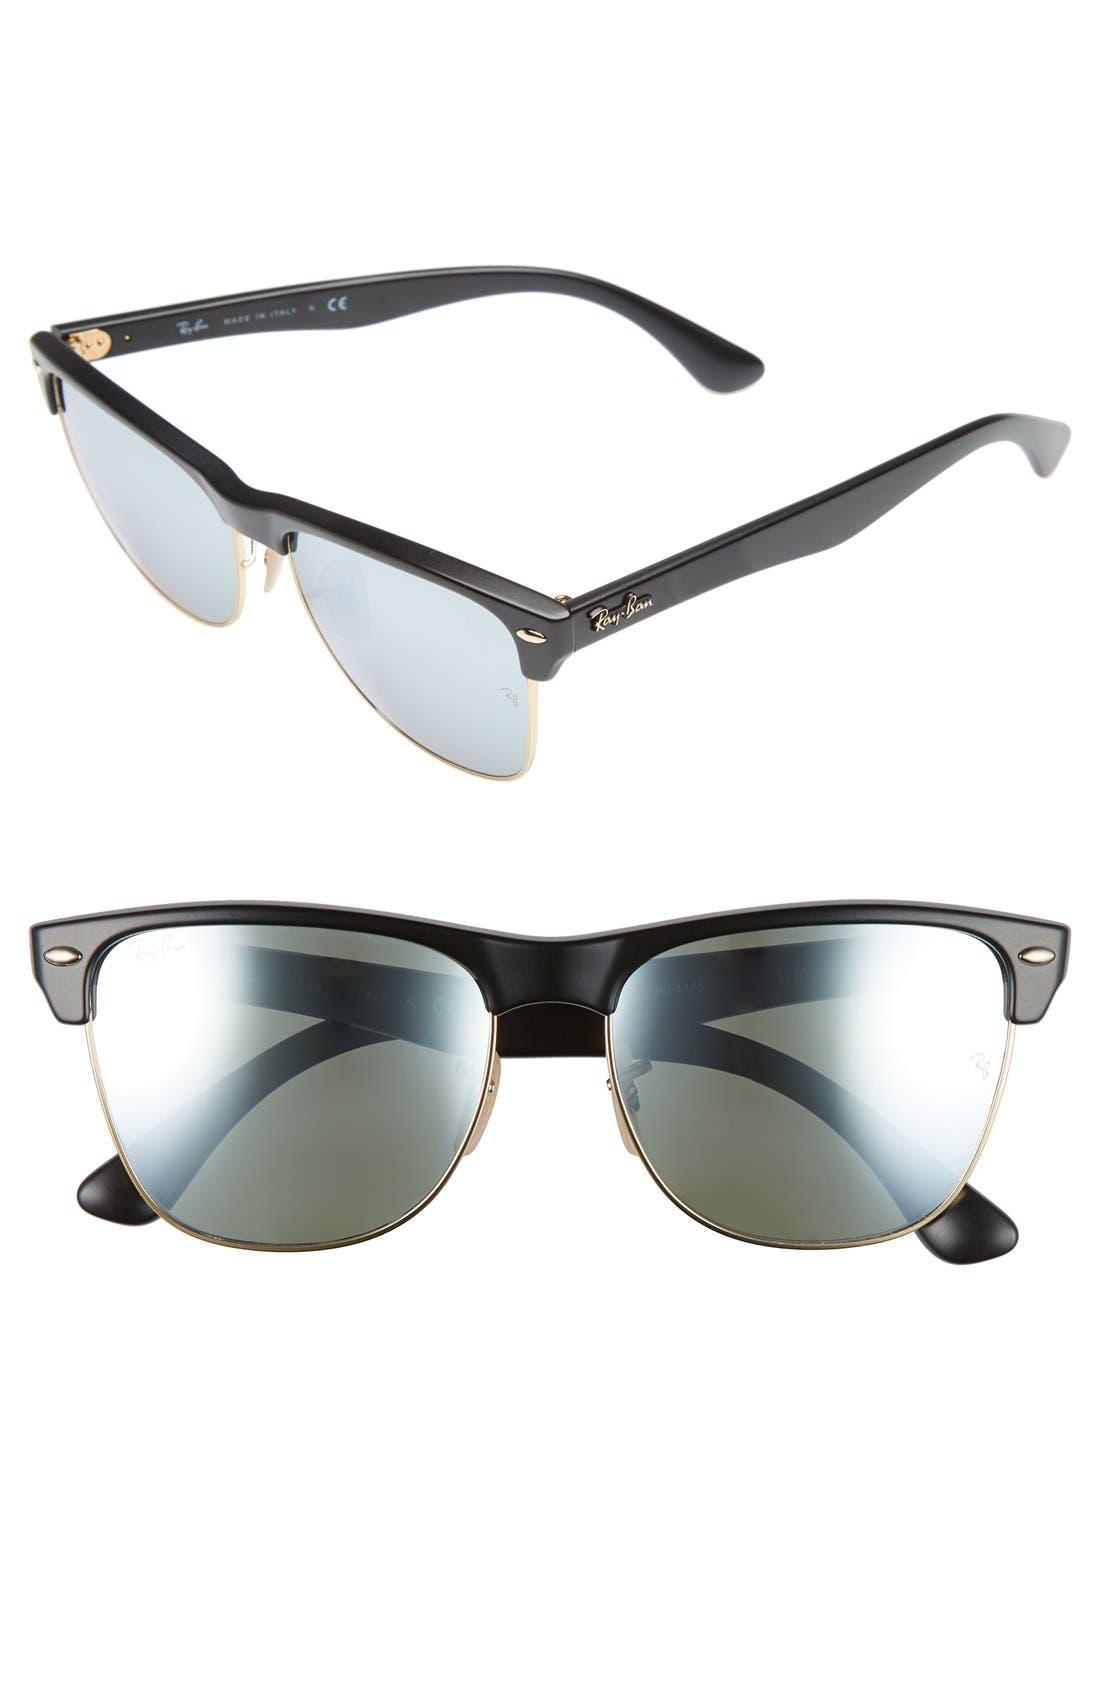 Main Image - Ray-Ban 'Highstreet' 57mm Sunglasses